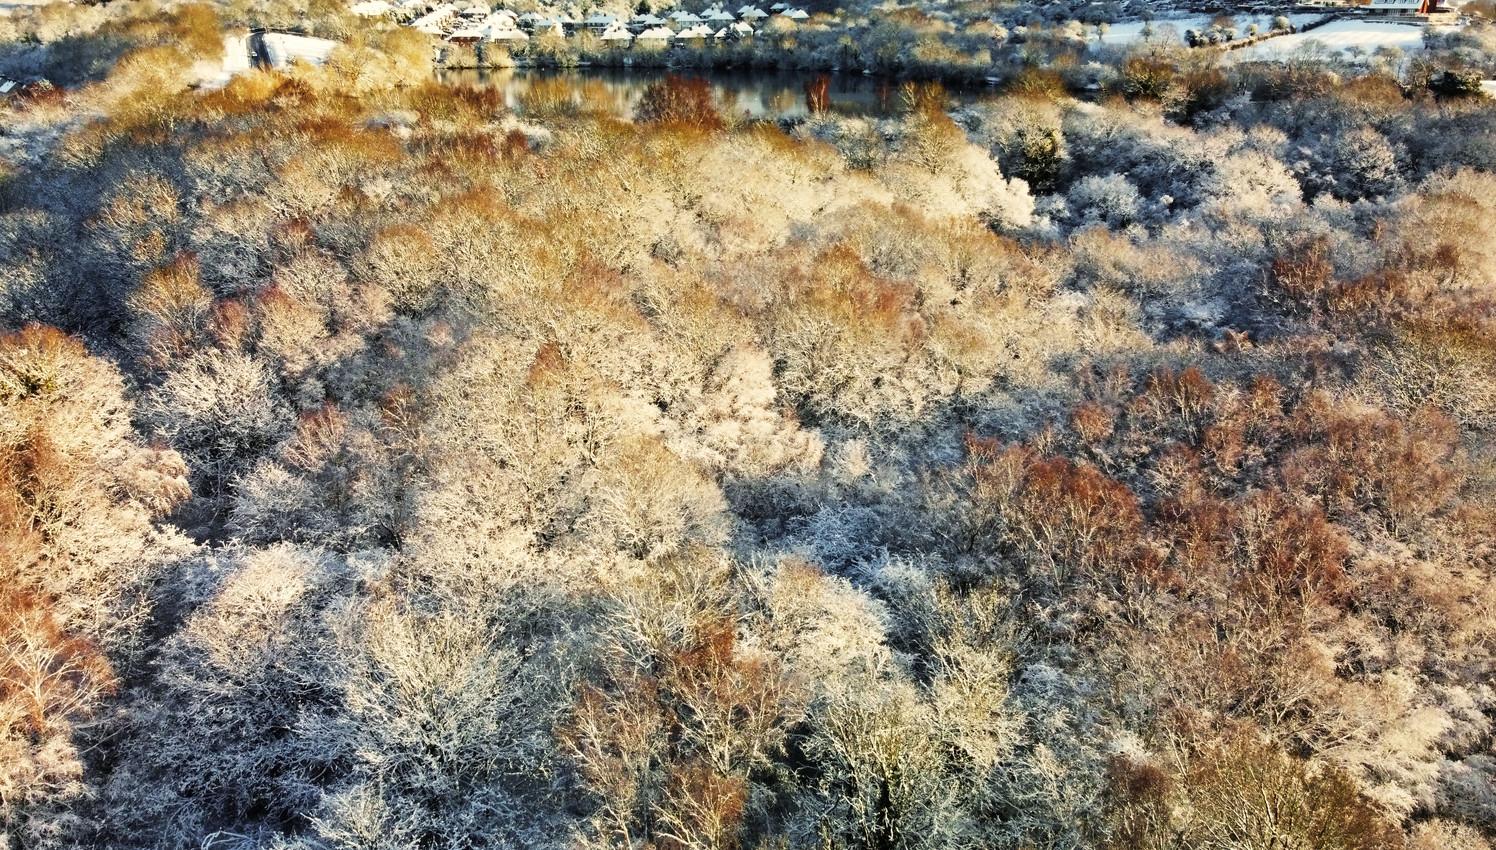 Saltwells Winter